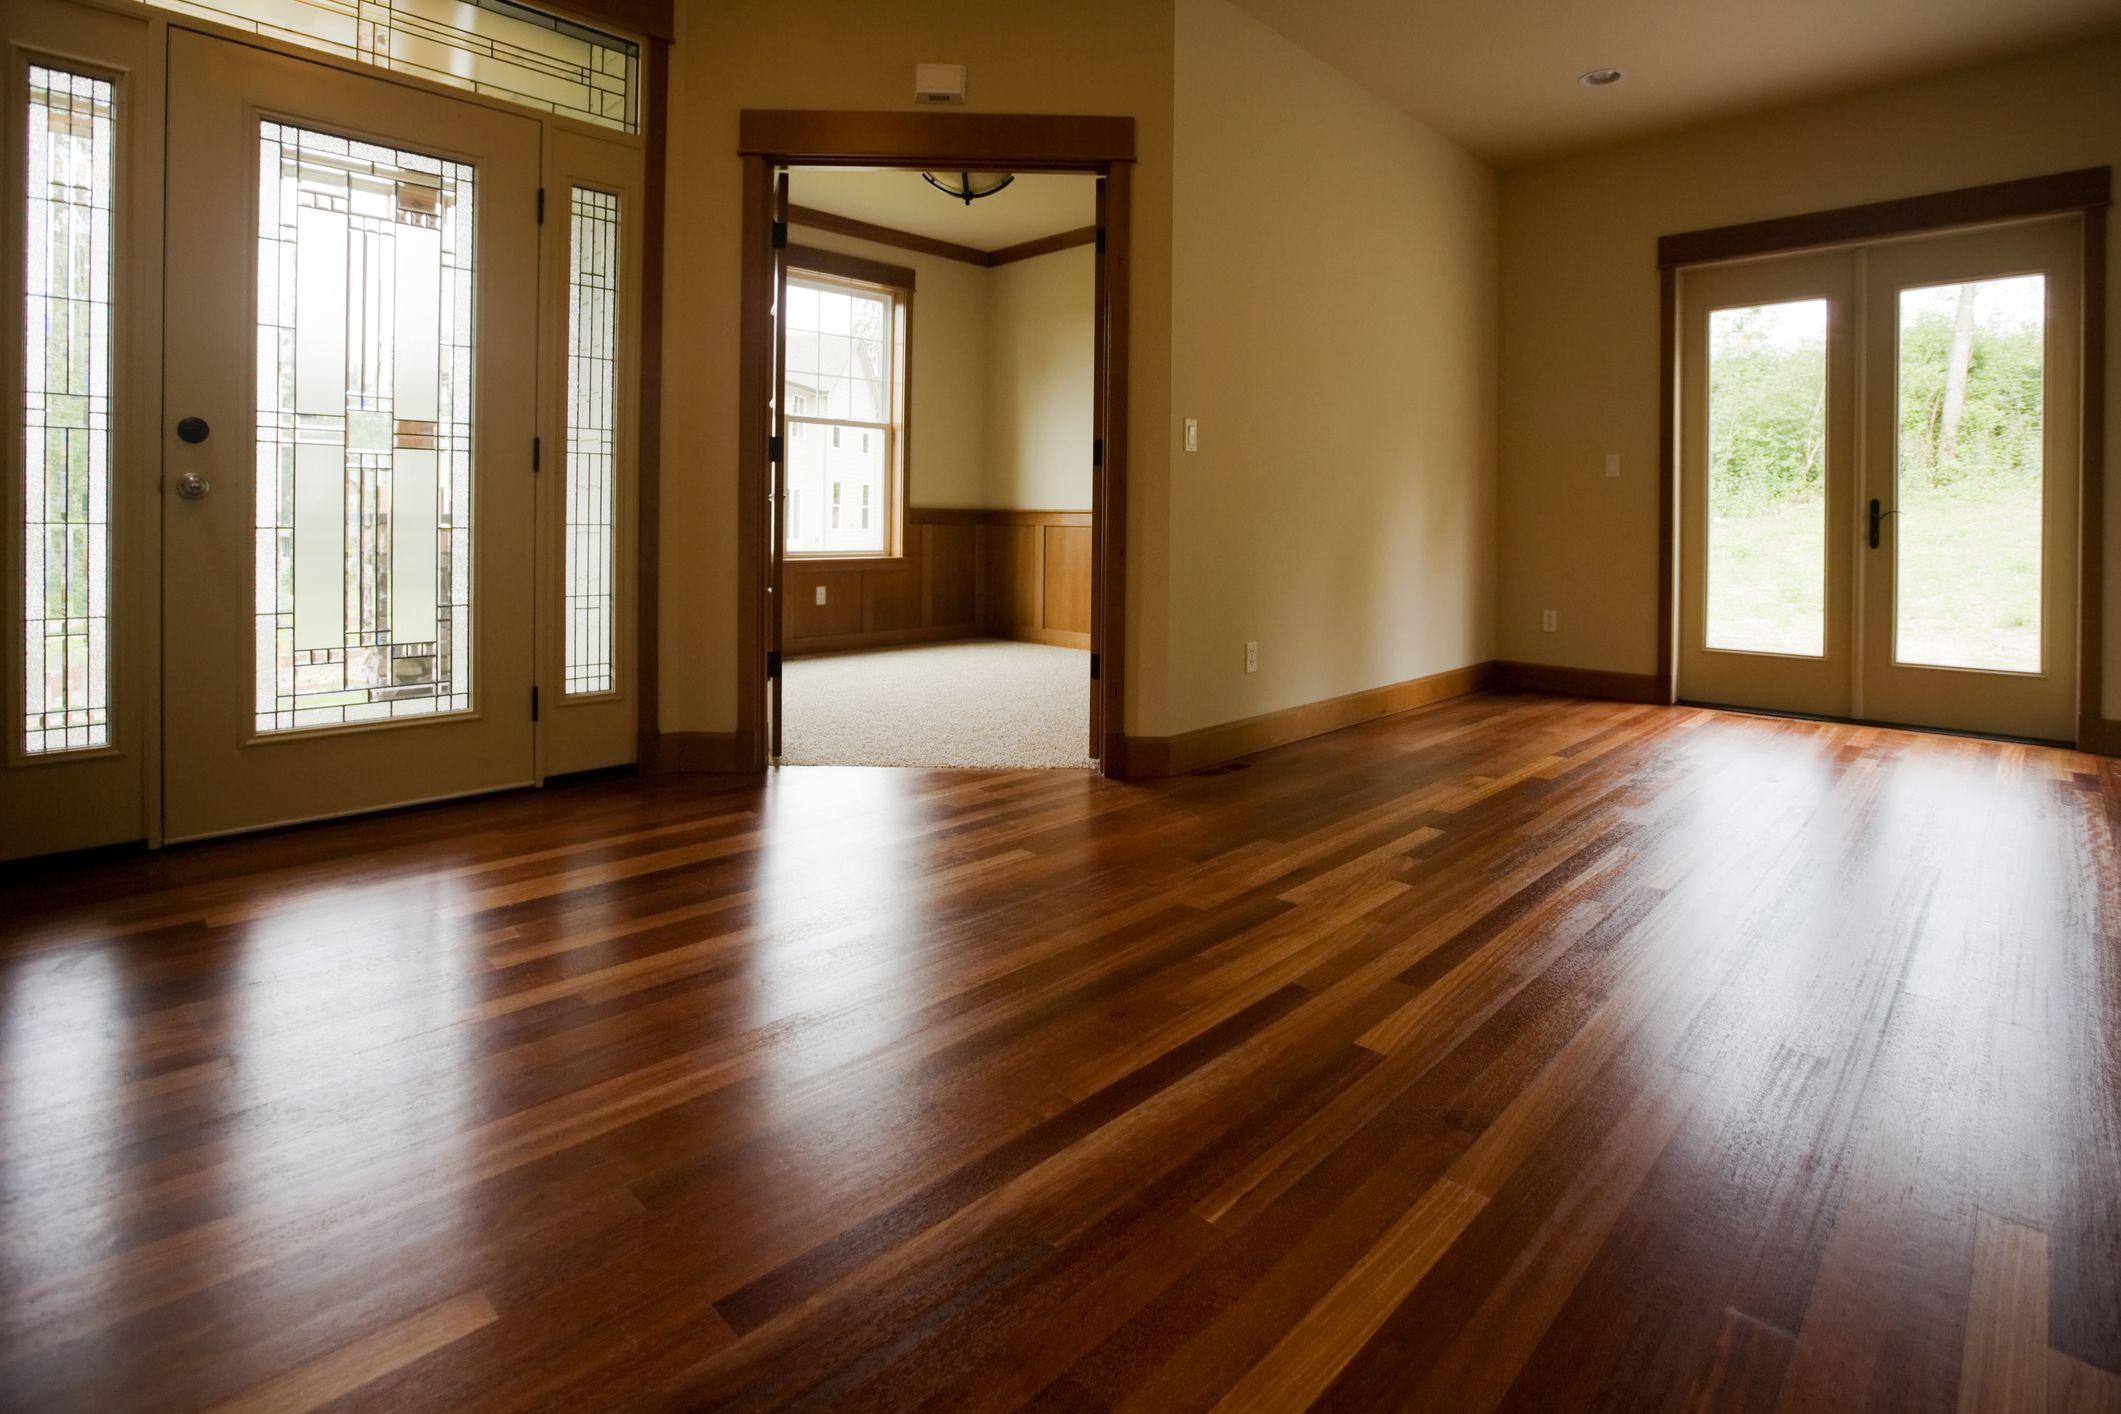 id engineered cherry flooring kitchen wood ireland floor american for japanese red artistic in jatoba